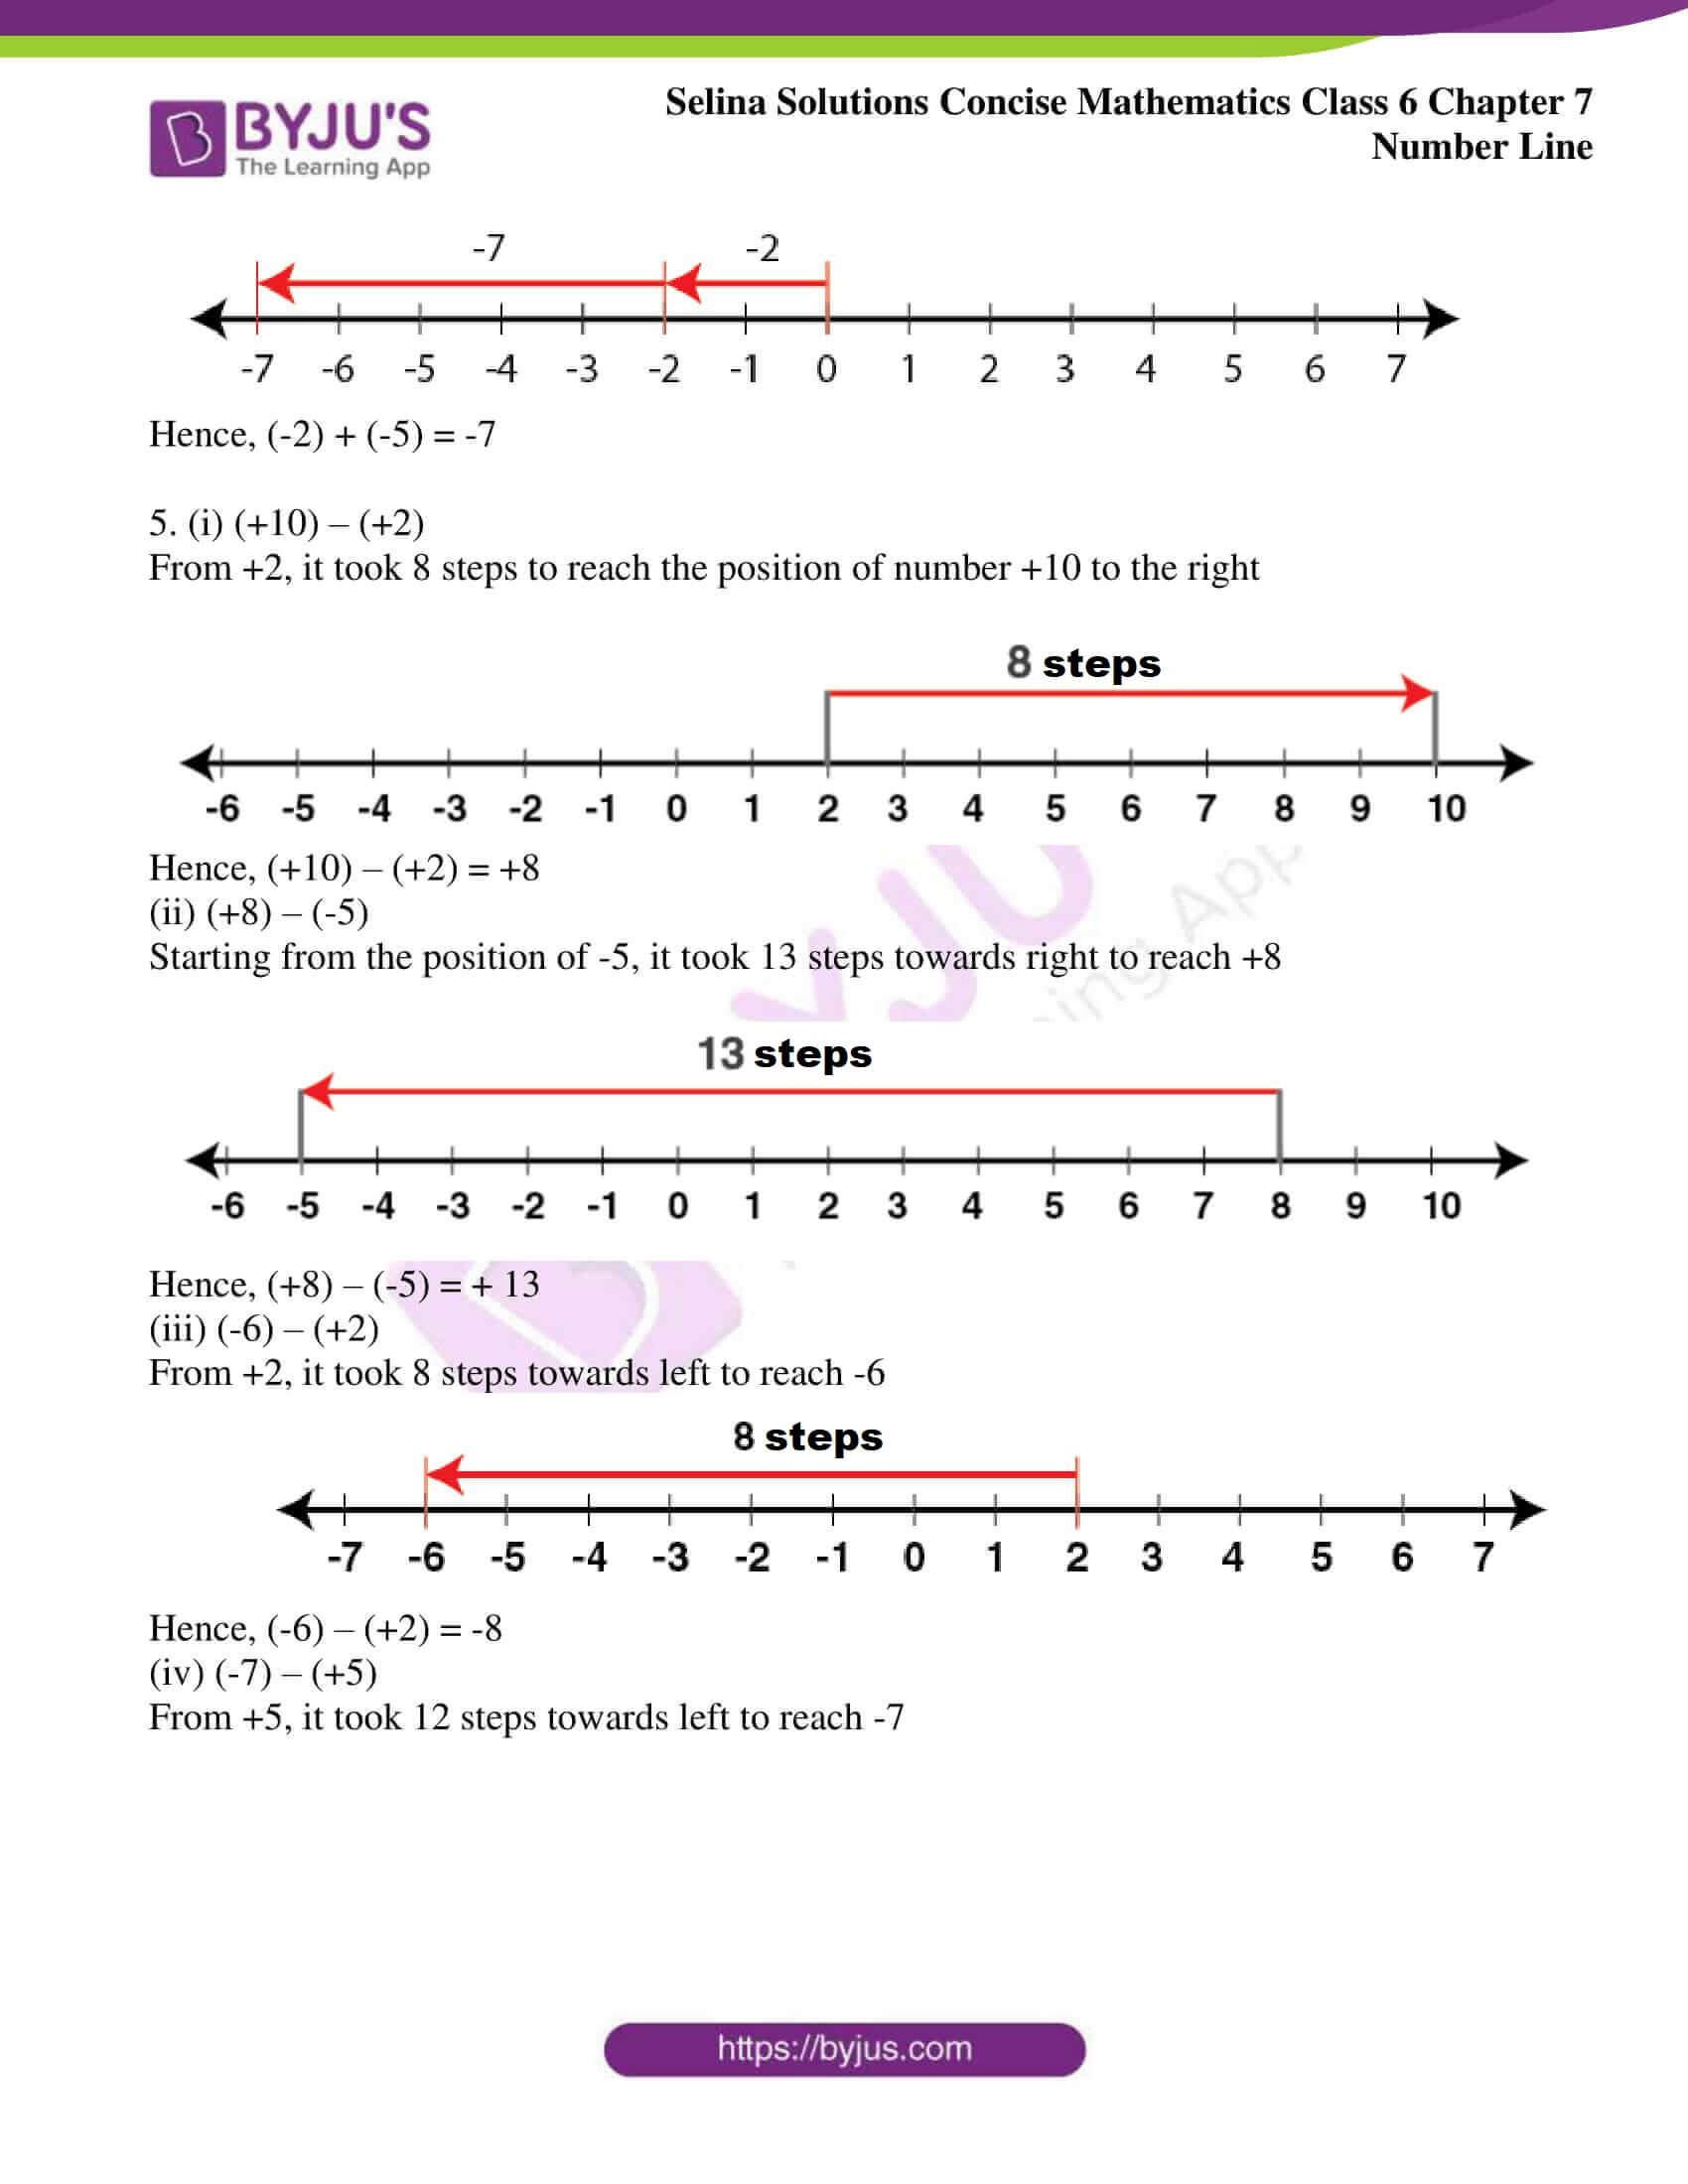 selina sol concise mathematics class 6 ch 7 ex b 4